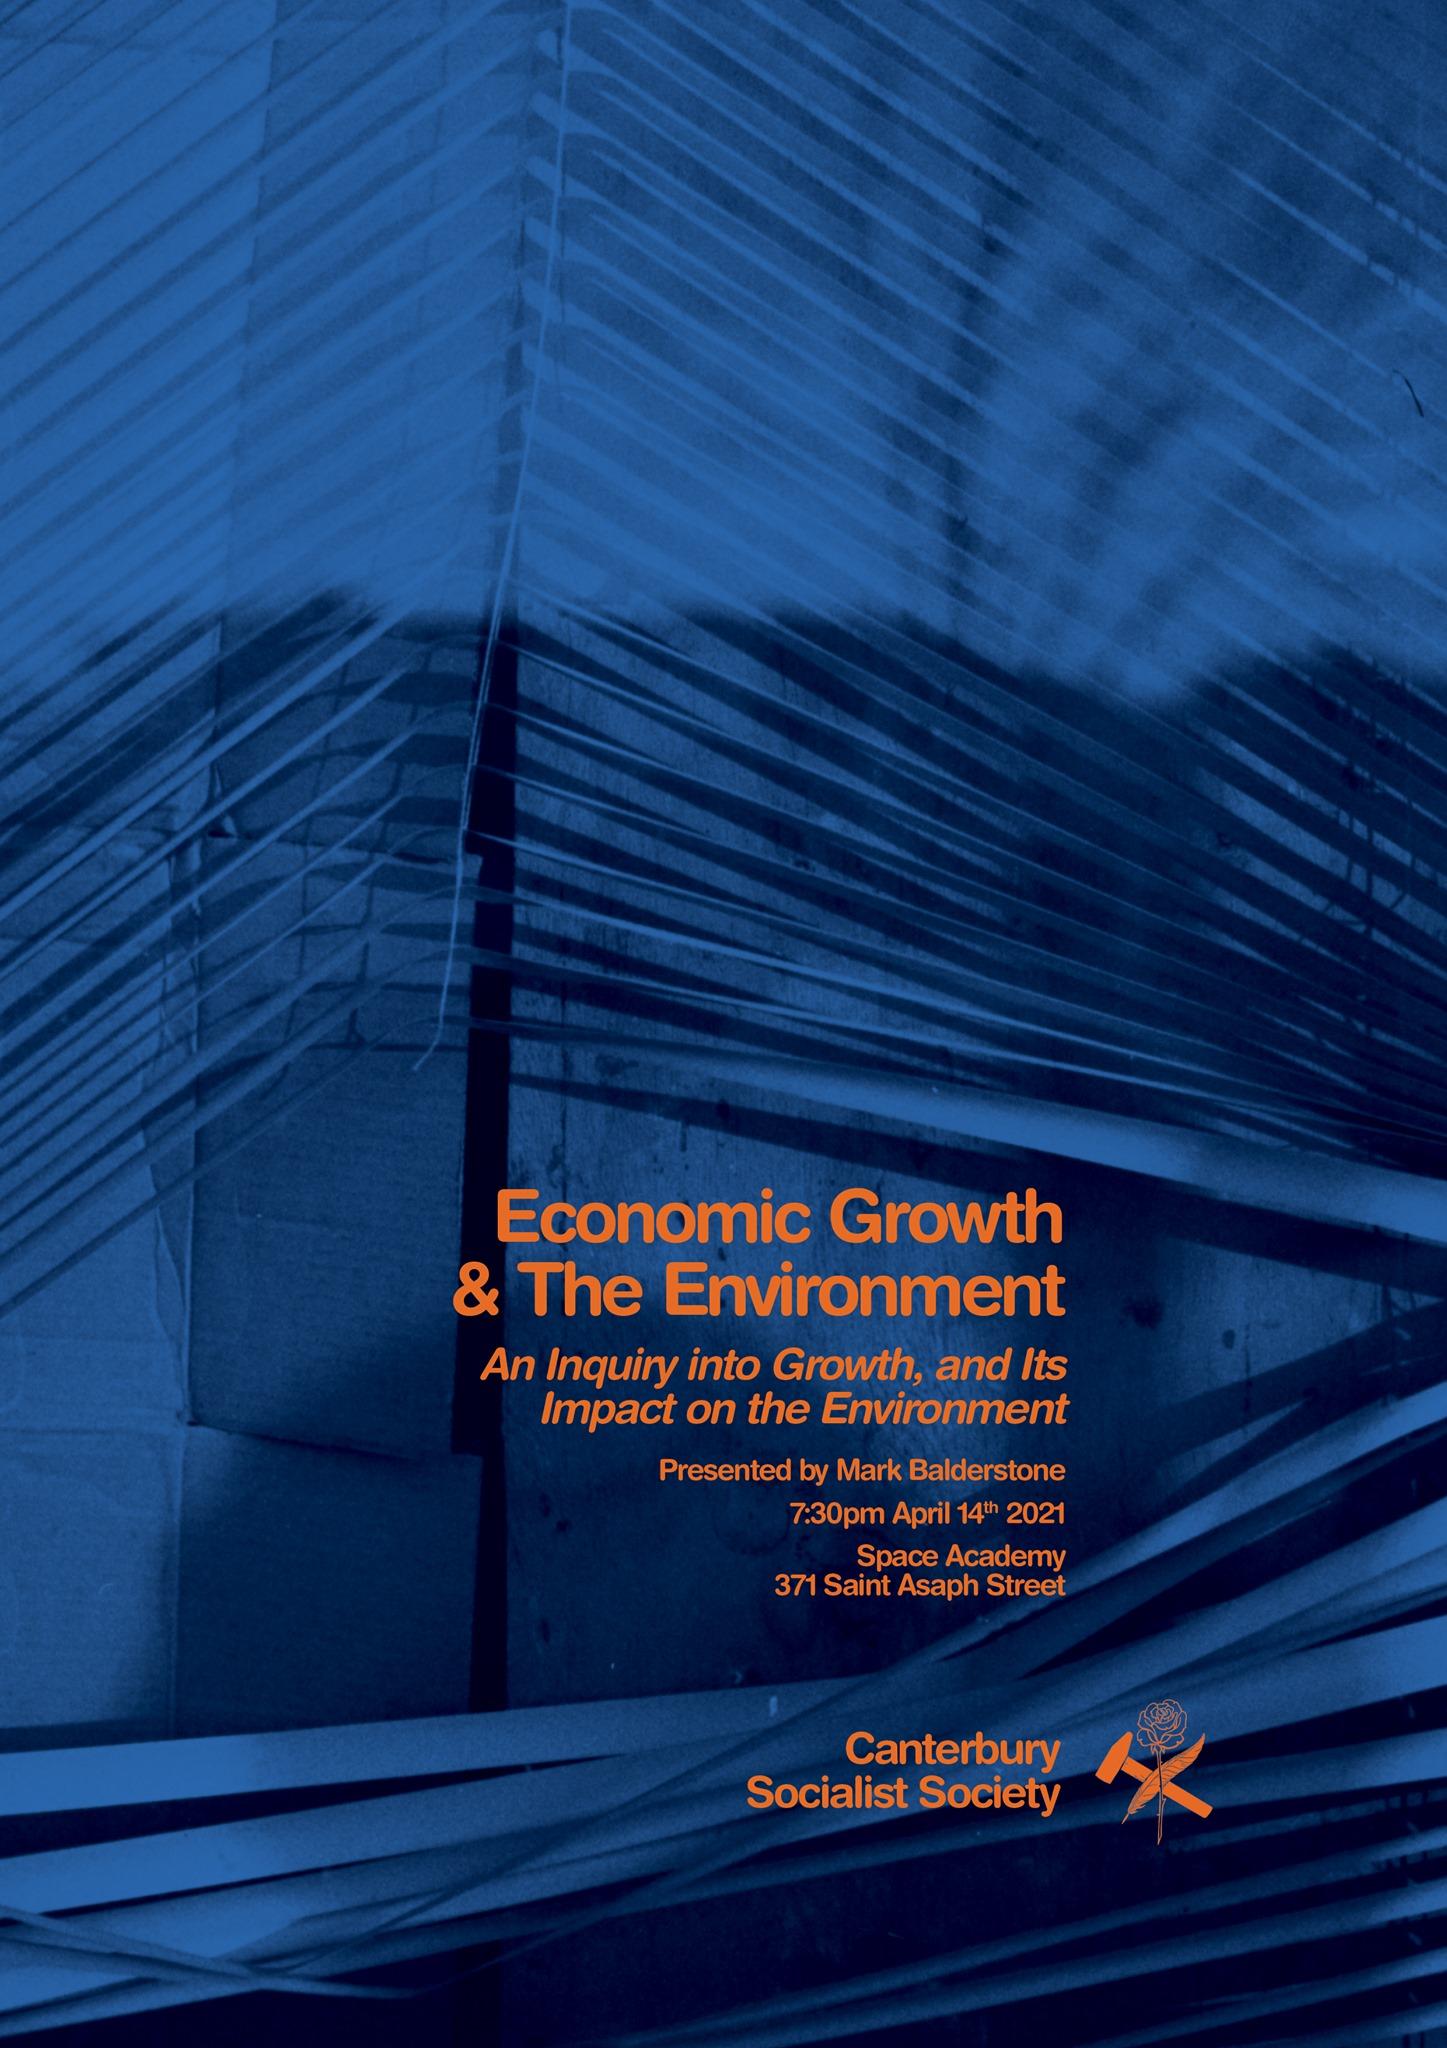 CSS Public Lecture: Economic Growth & The Environment